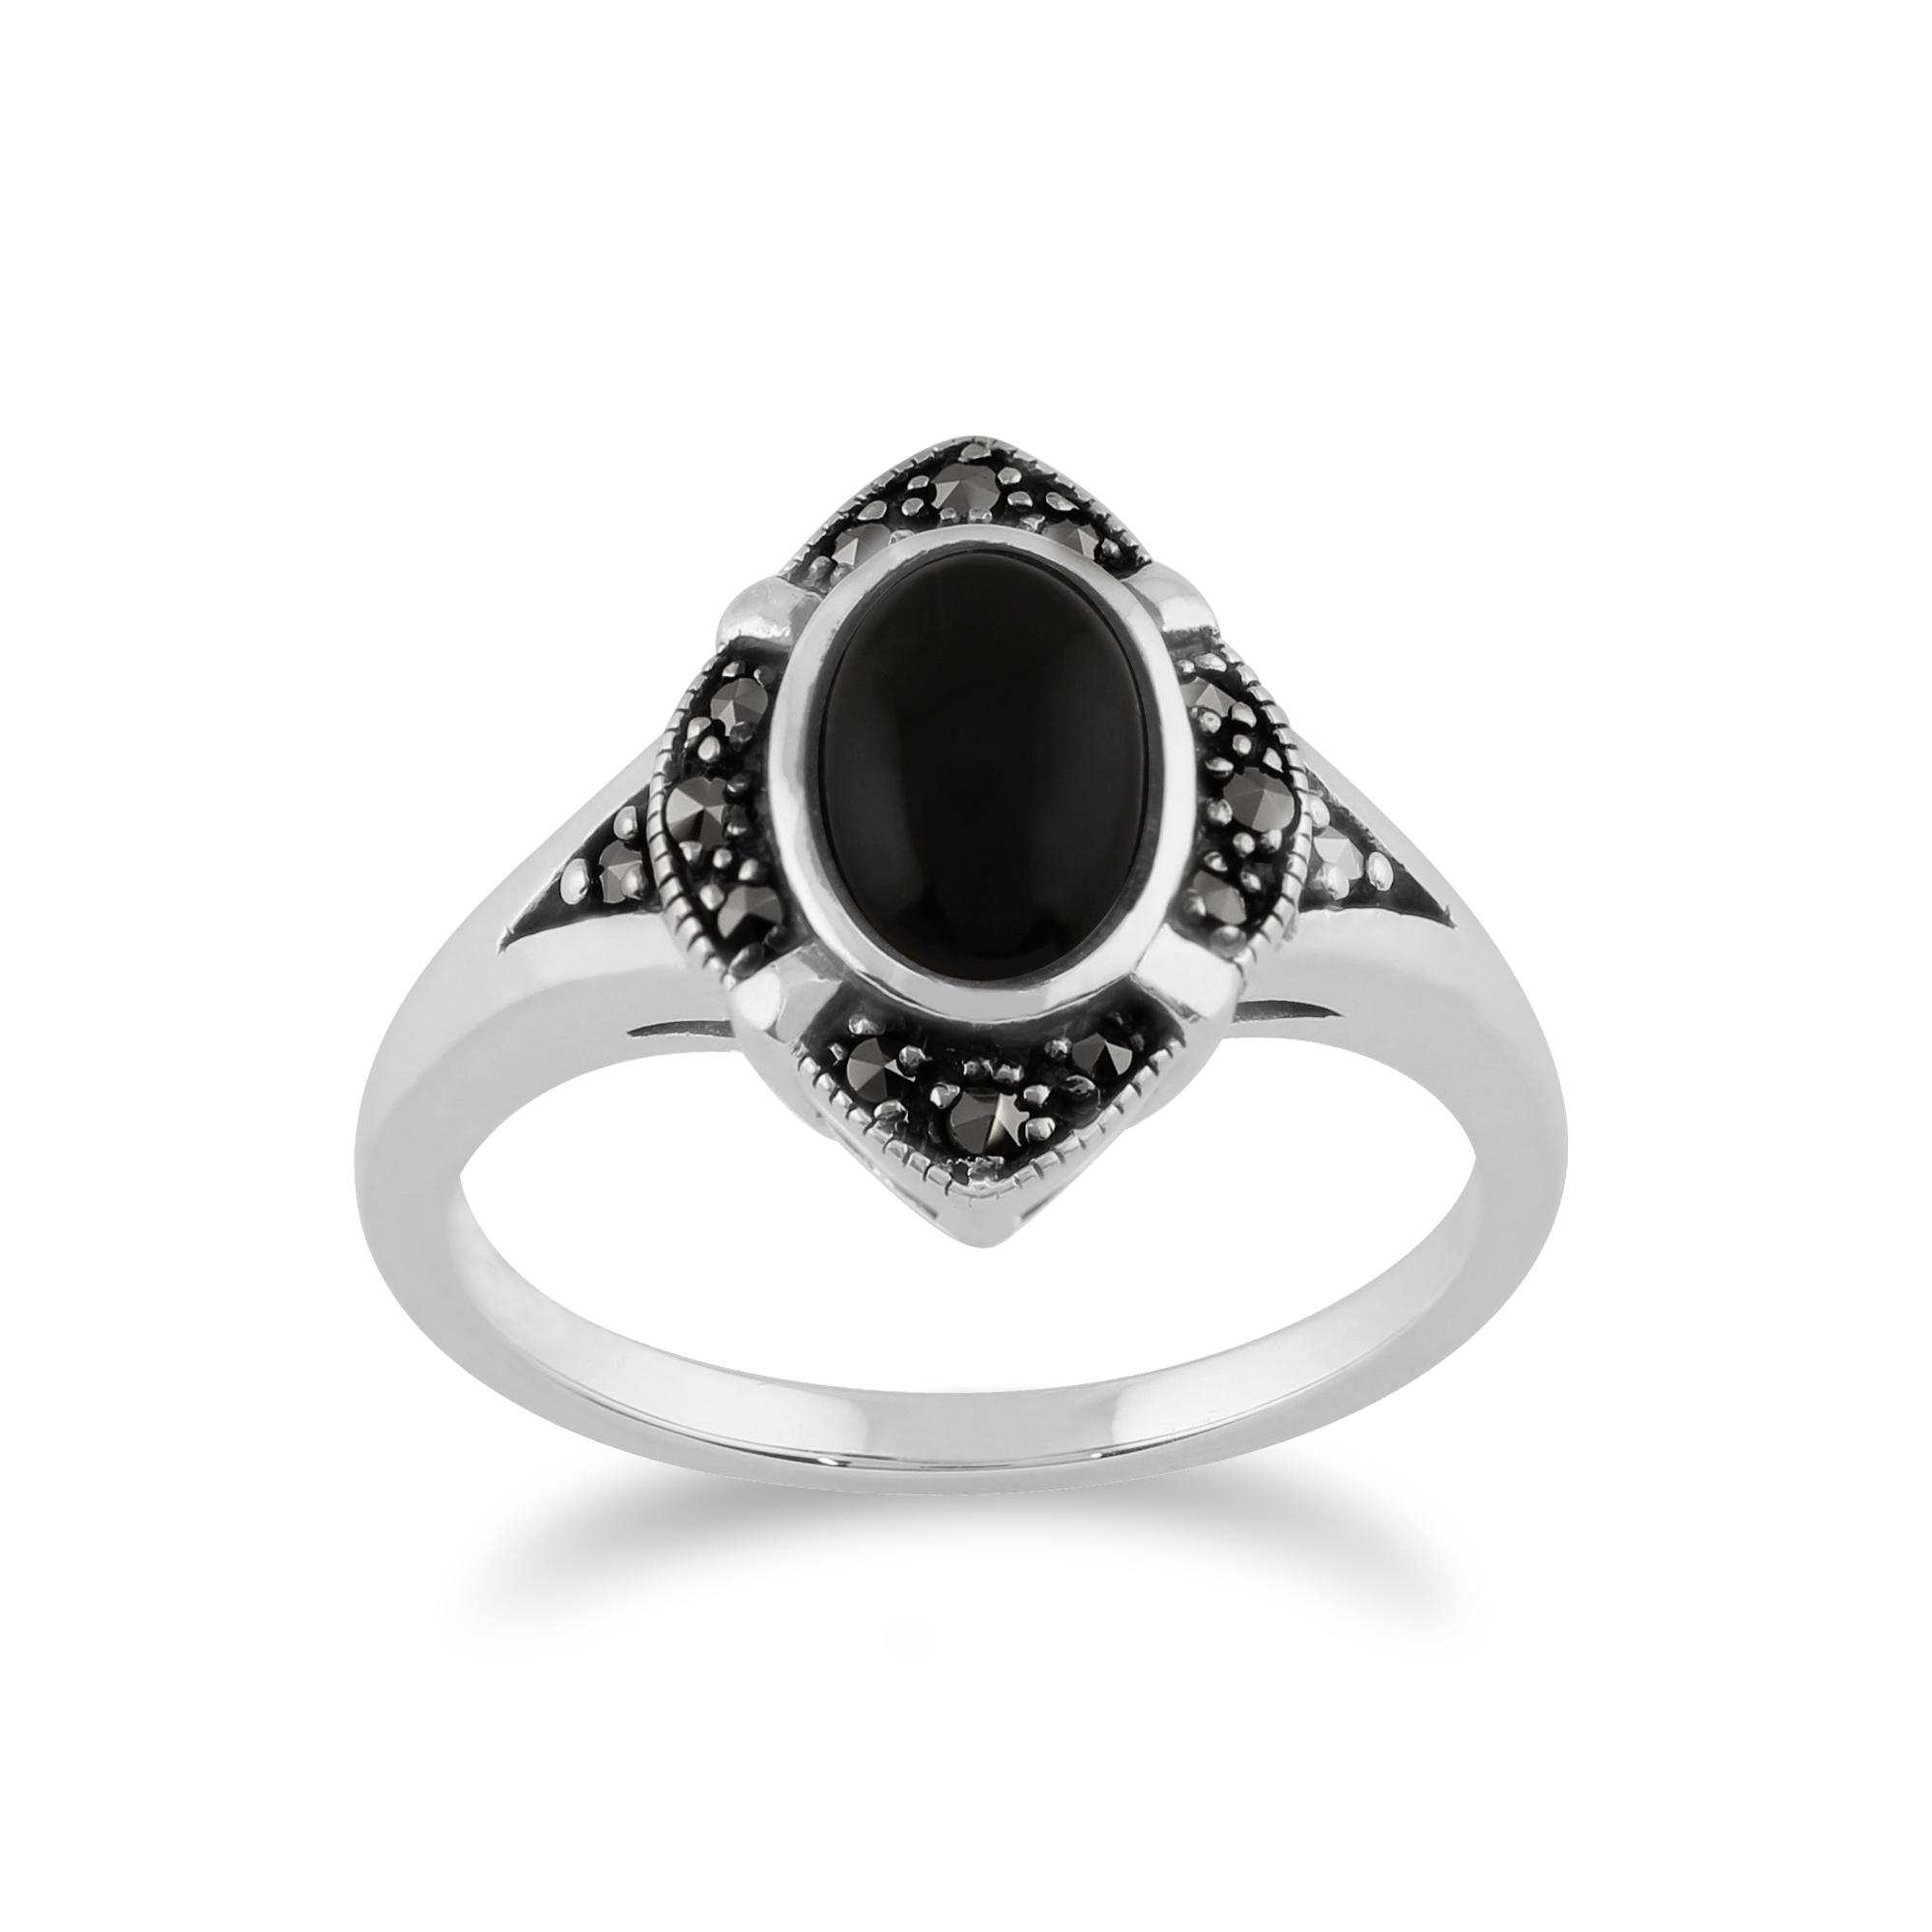 Gemondo 925 Sterling Silver 1.00ct Black Onyx & Marcasite Art Deco Ring